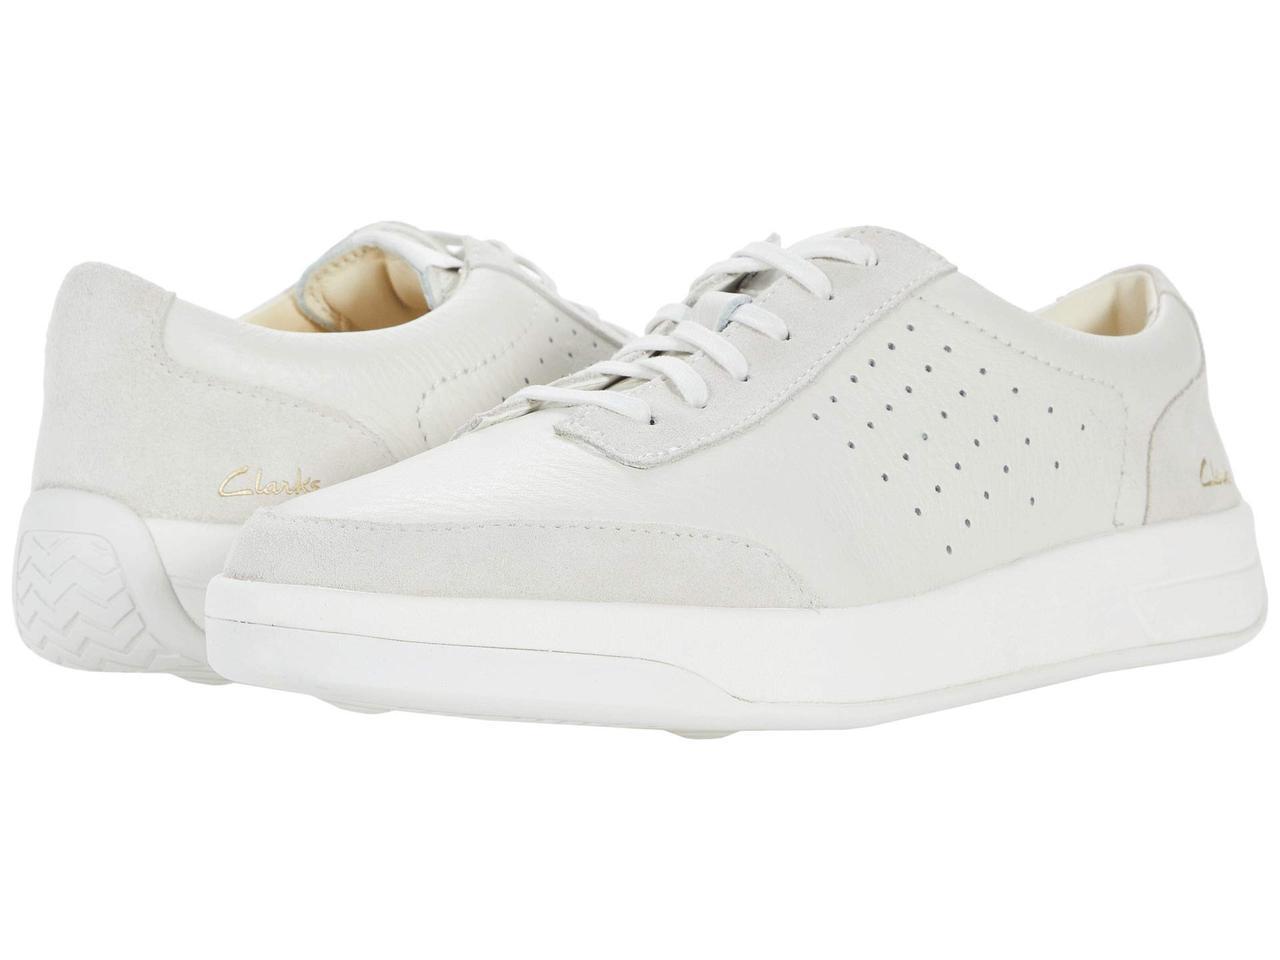 Кроссовки/Кеды (Оригинал) Clarks Hero Air Lace White Leather